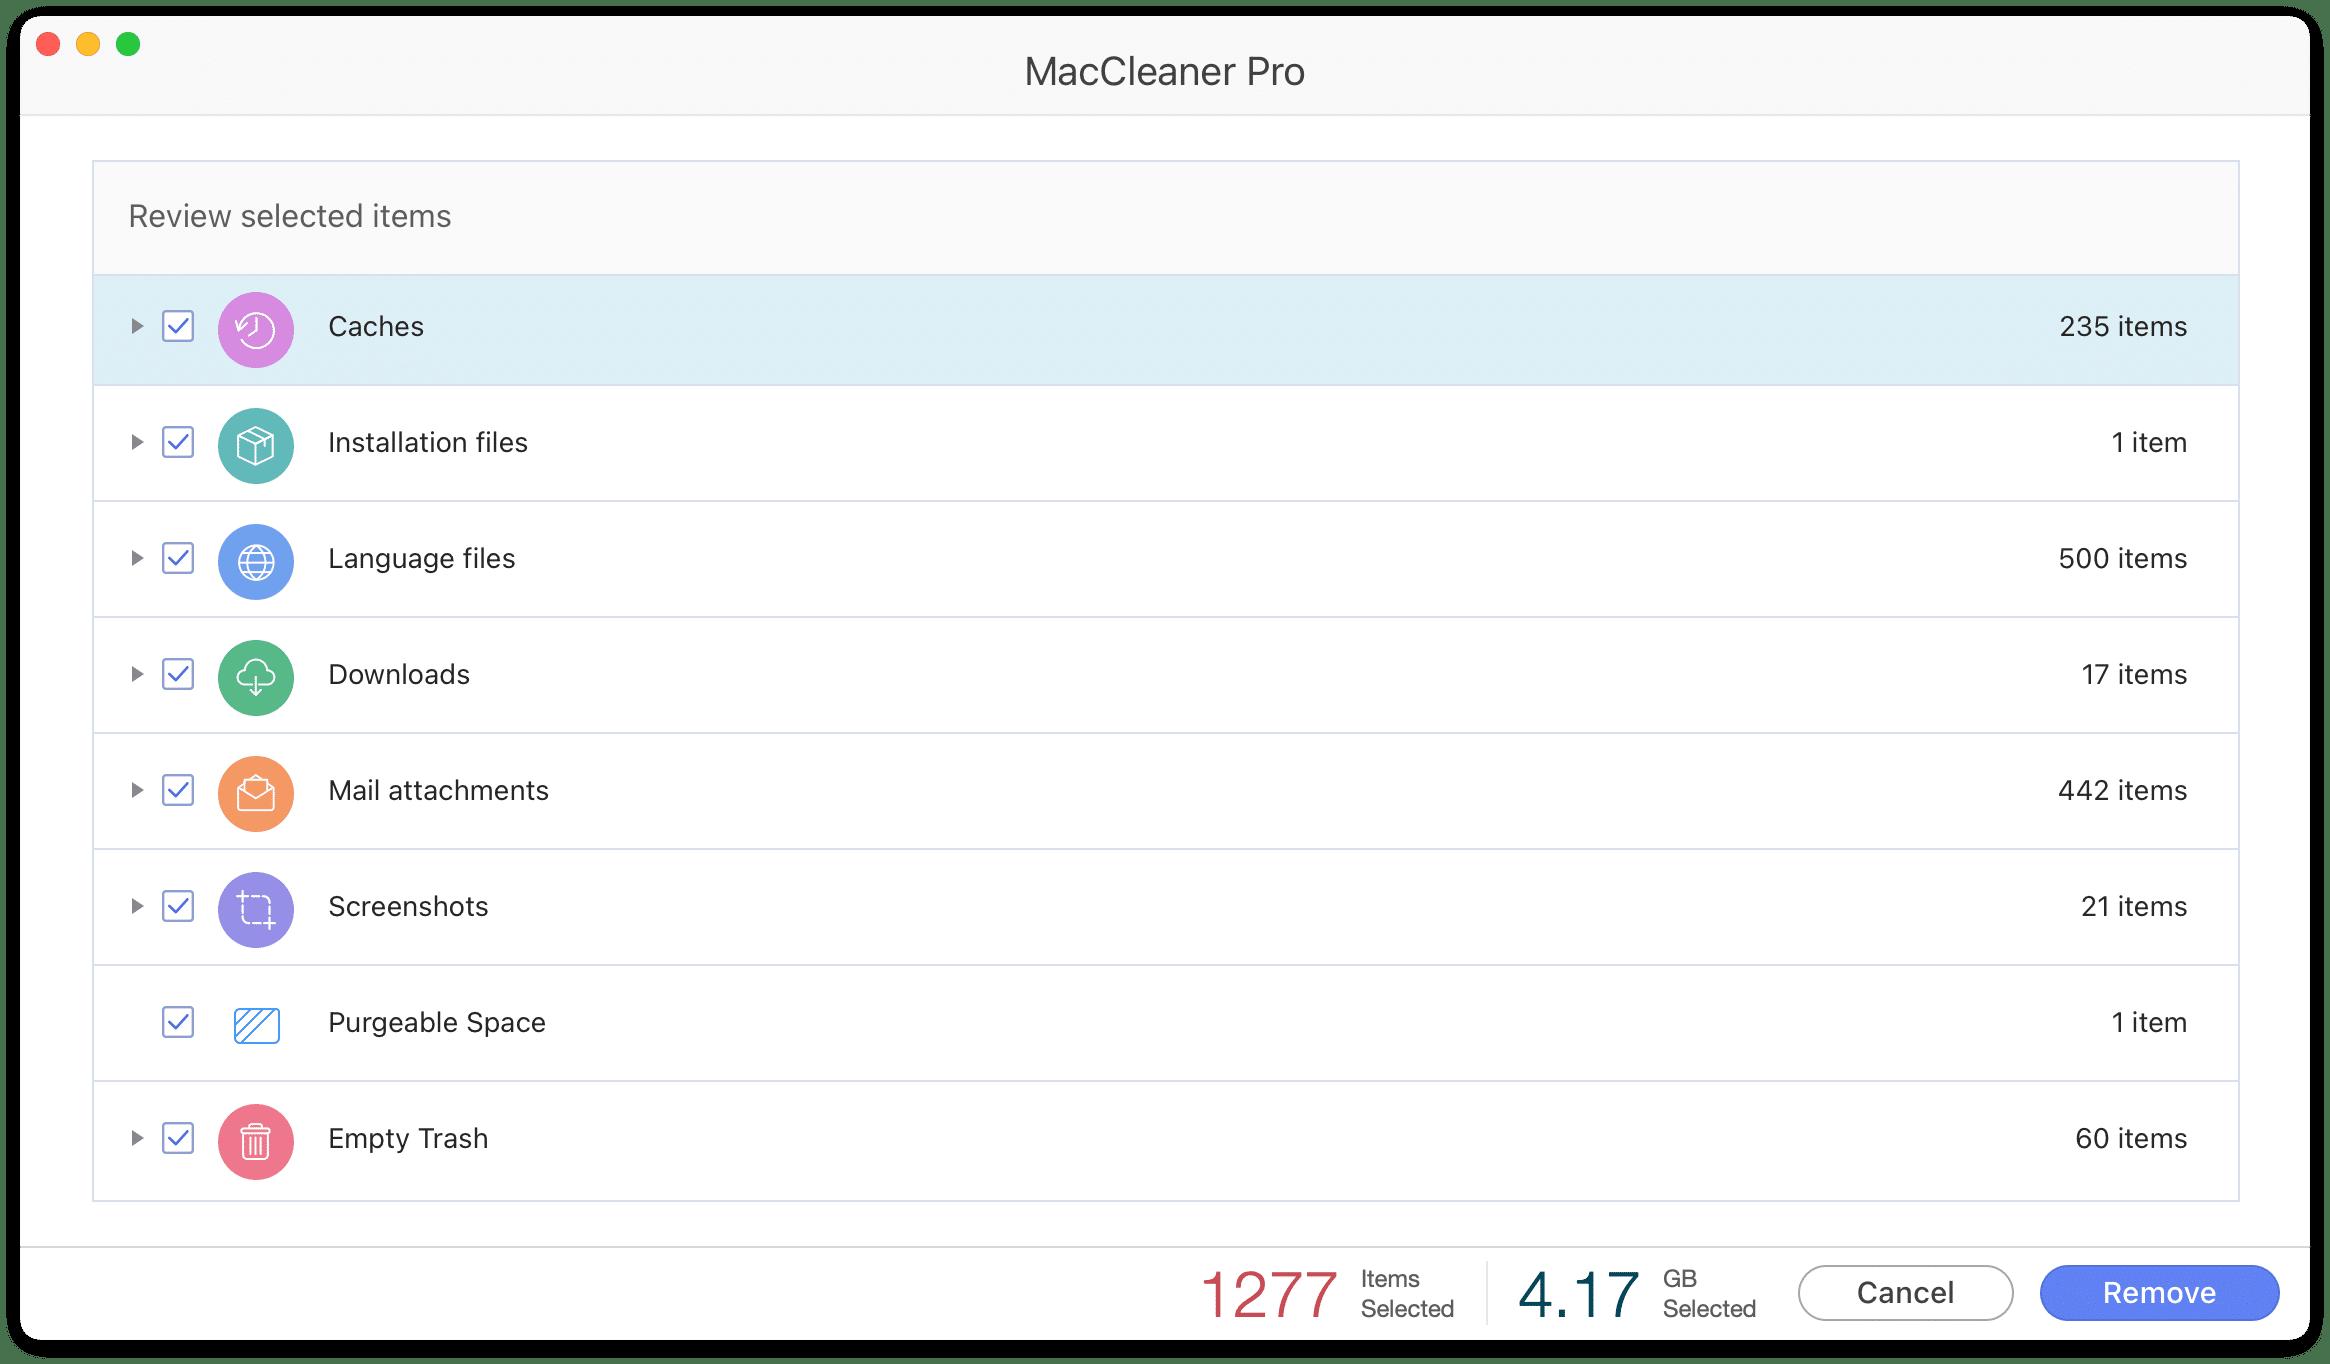 MacCleaner Pro confirmation window